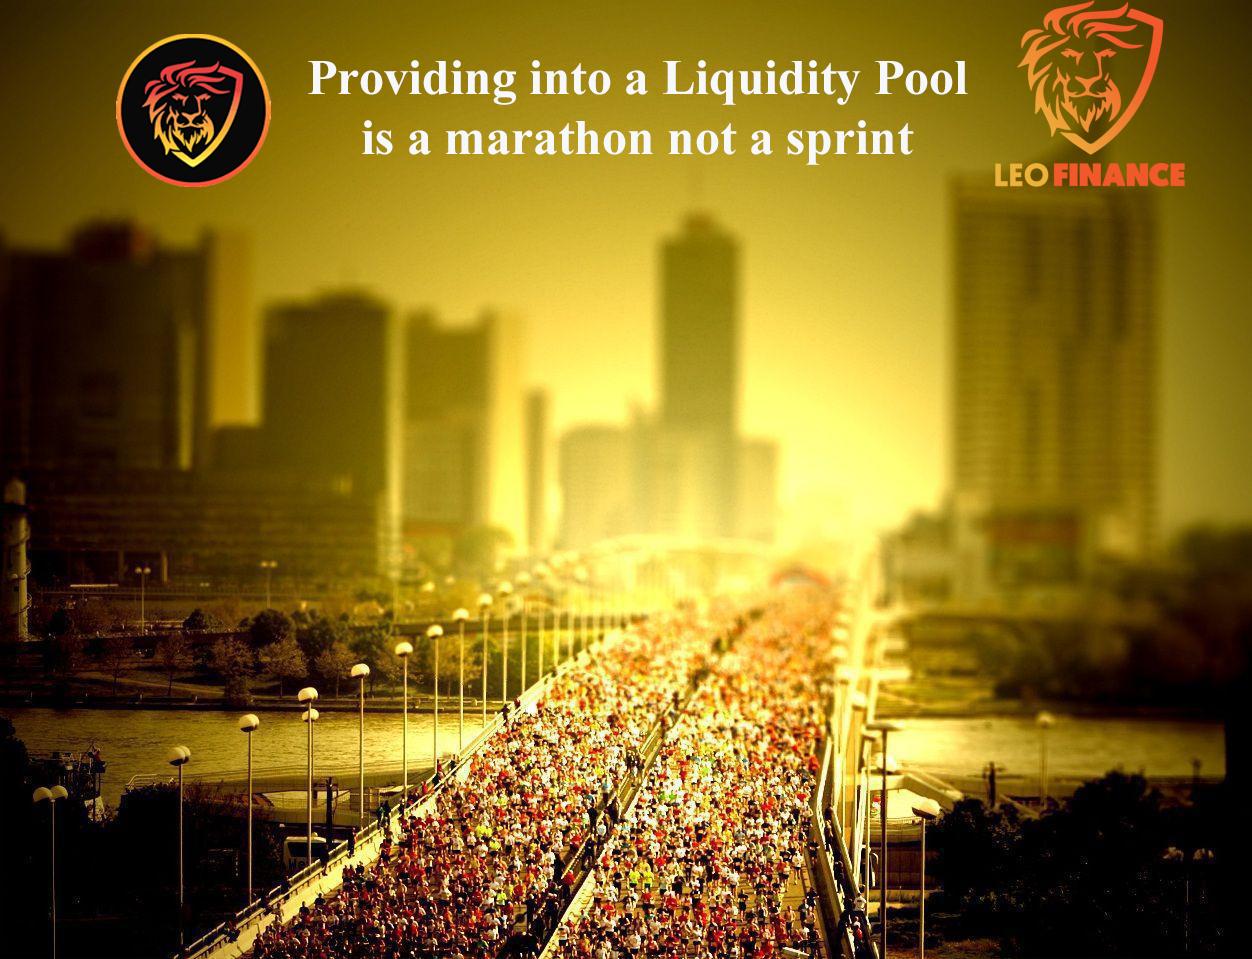 leofinance_liquidity_provider.jpg